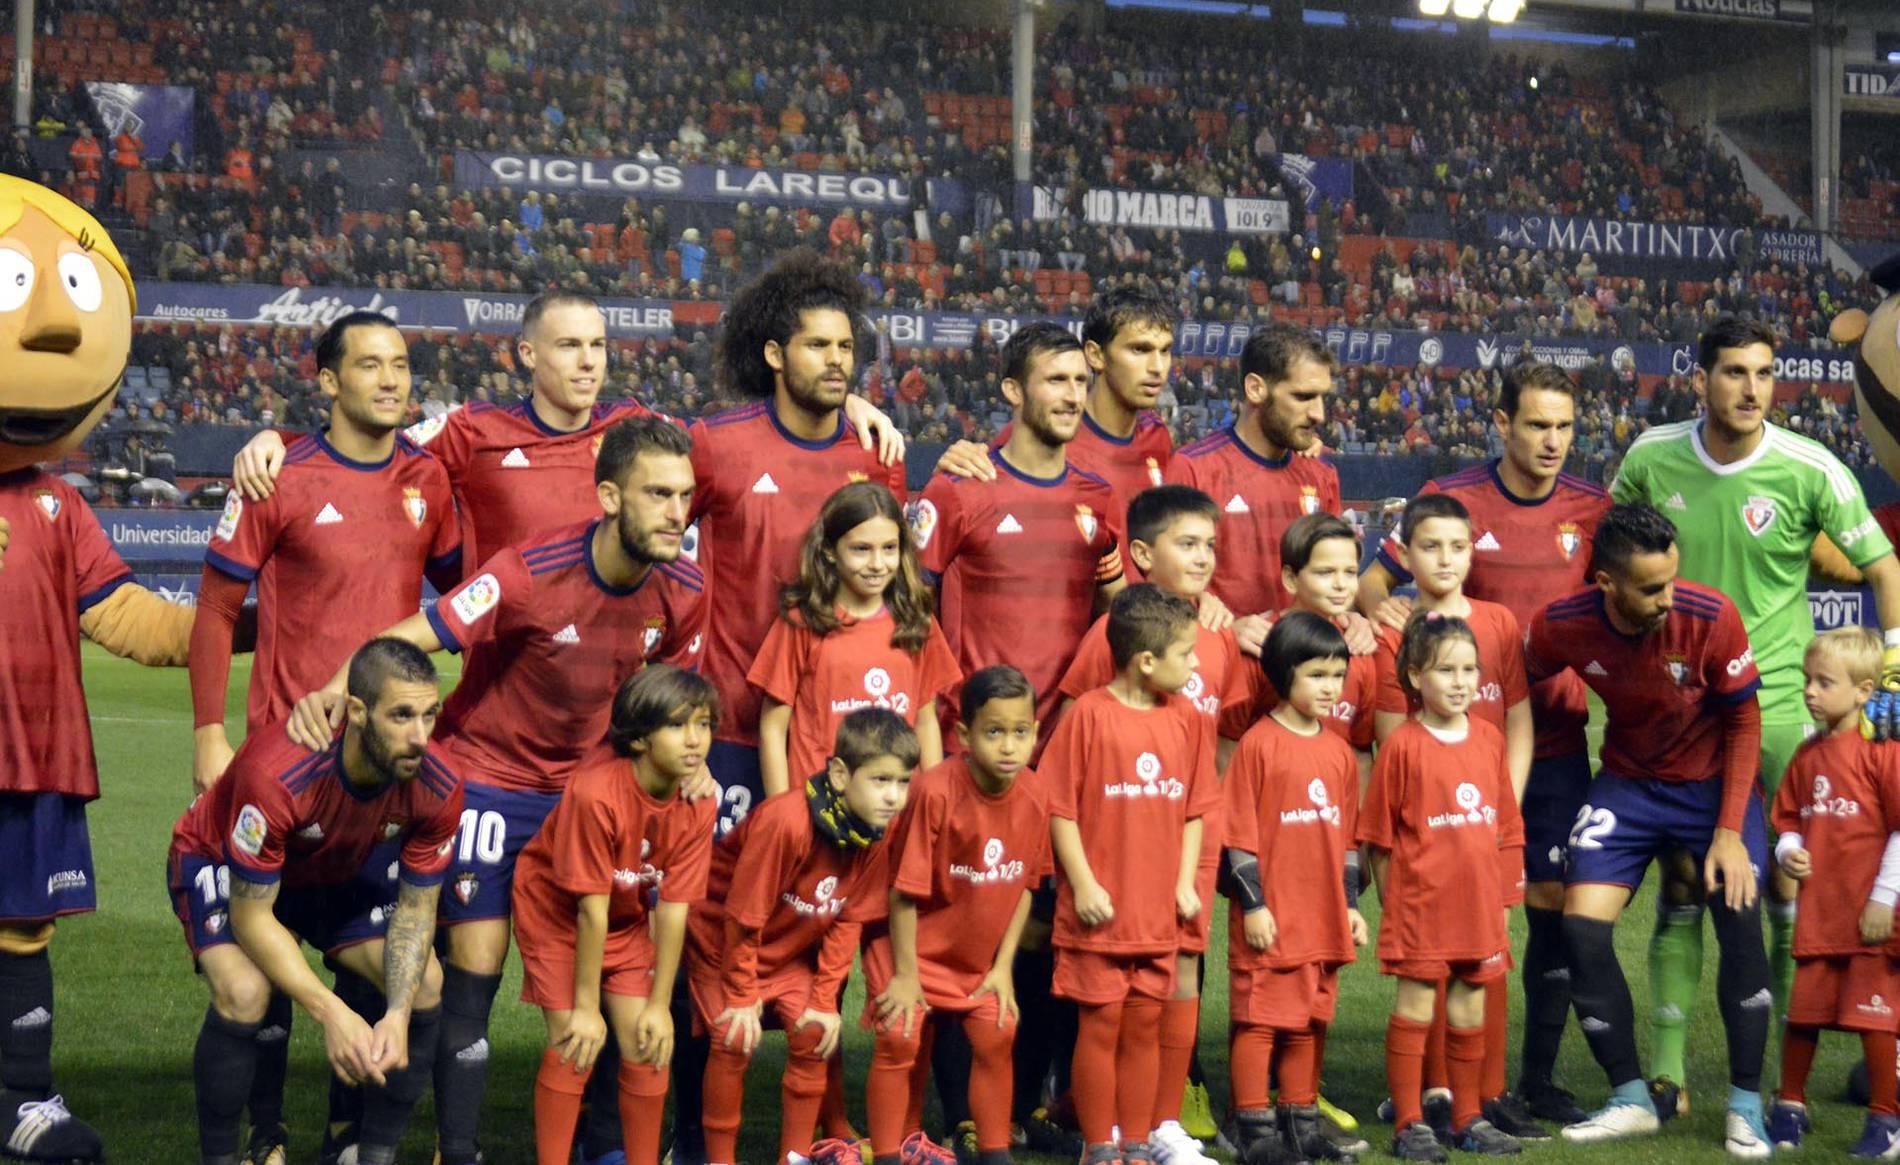 Osasuna 0-0 Granada (I) (1/24) - Osasuna 0-0 Granada (I) - Osasuna -